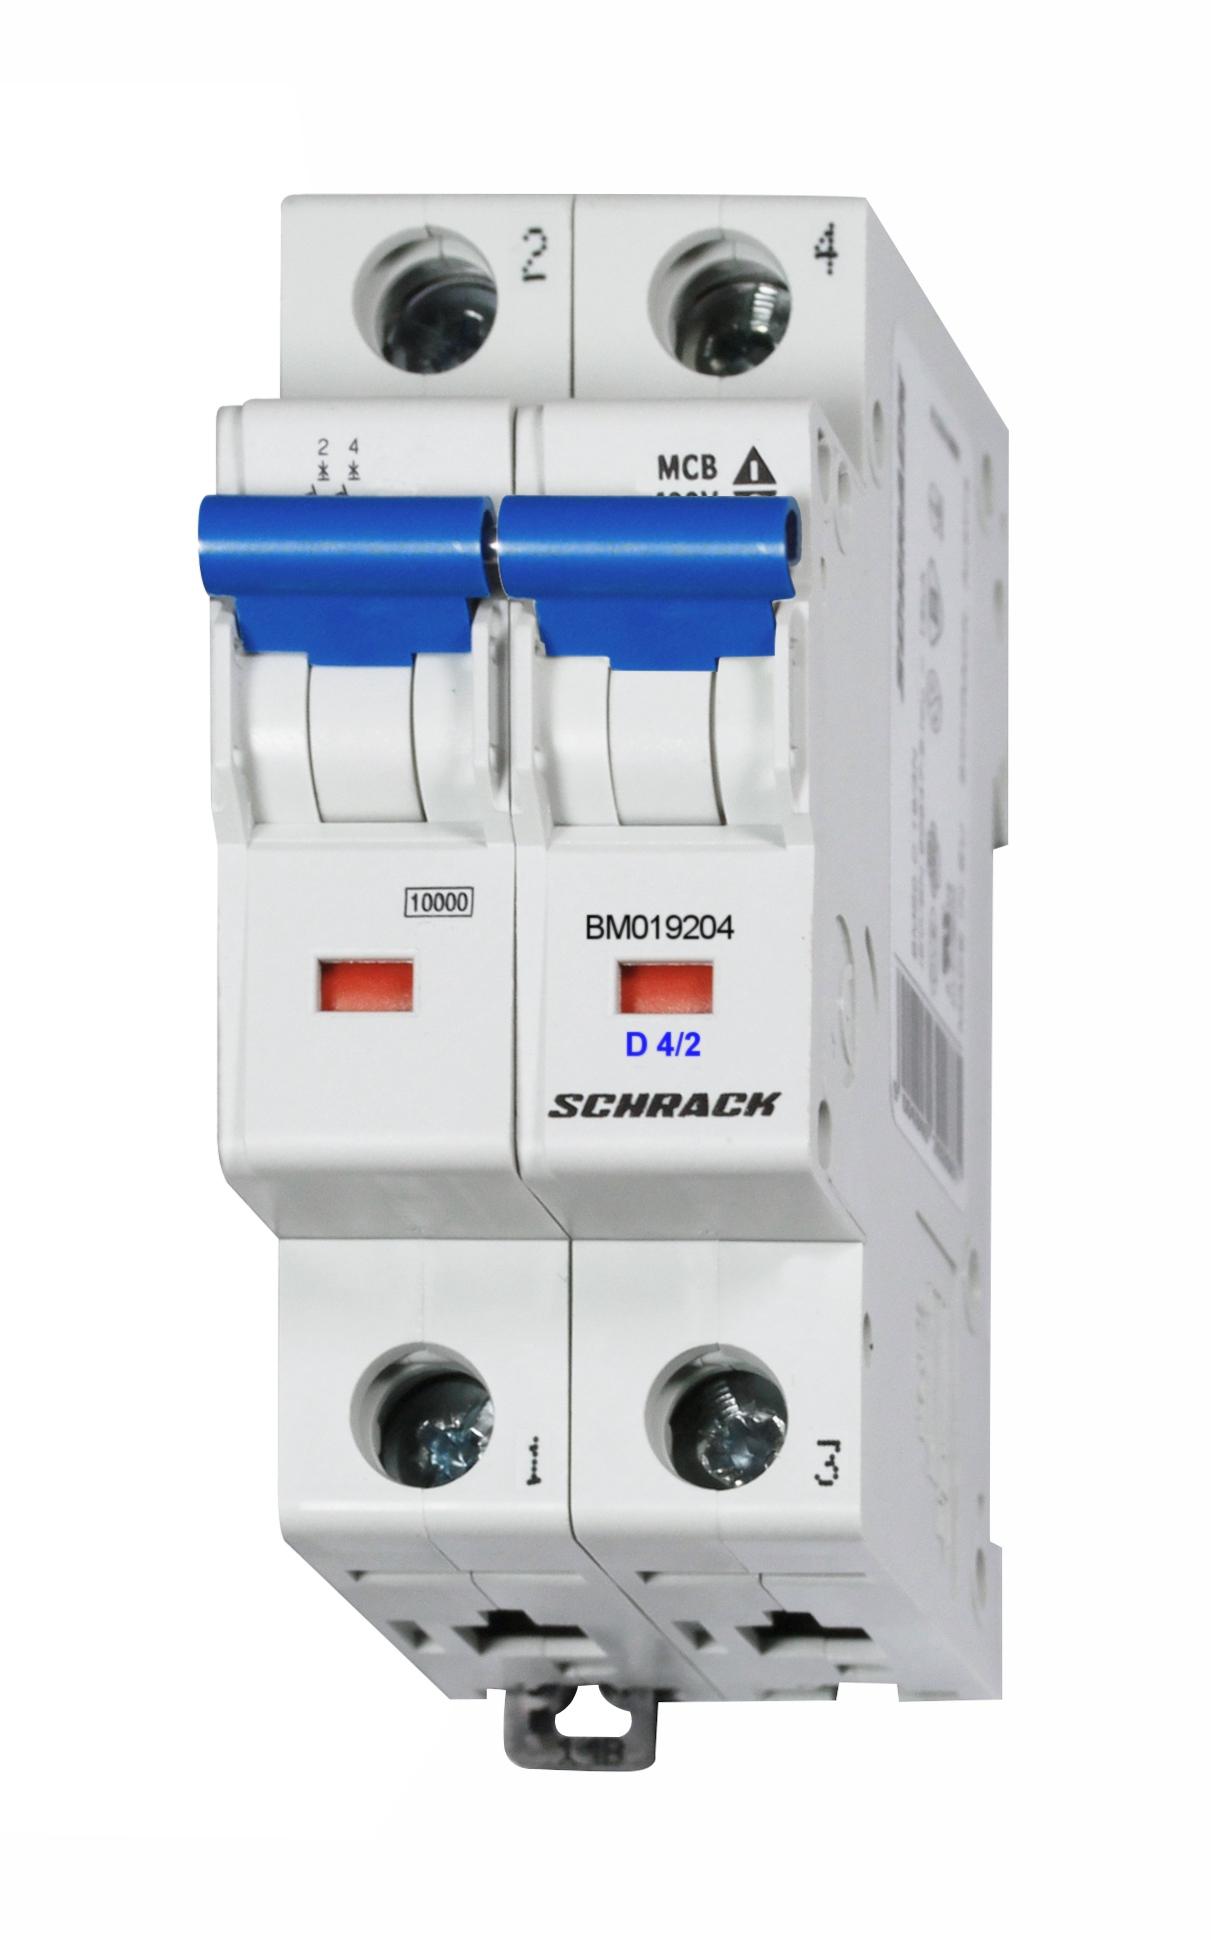 BM019204 - Schrack Technik